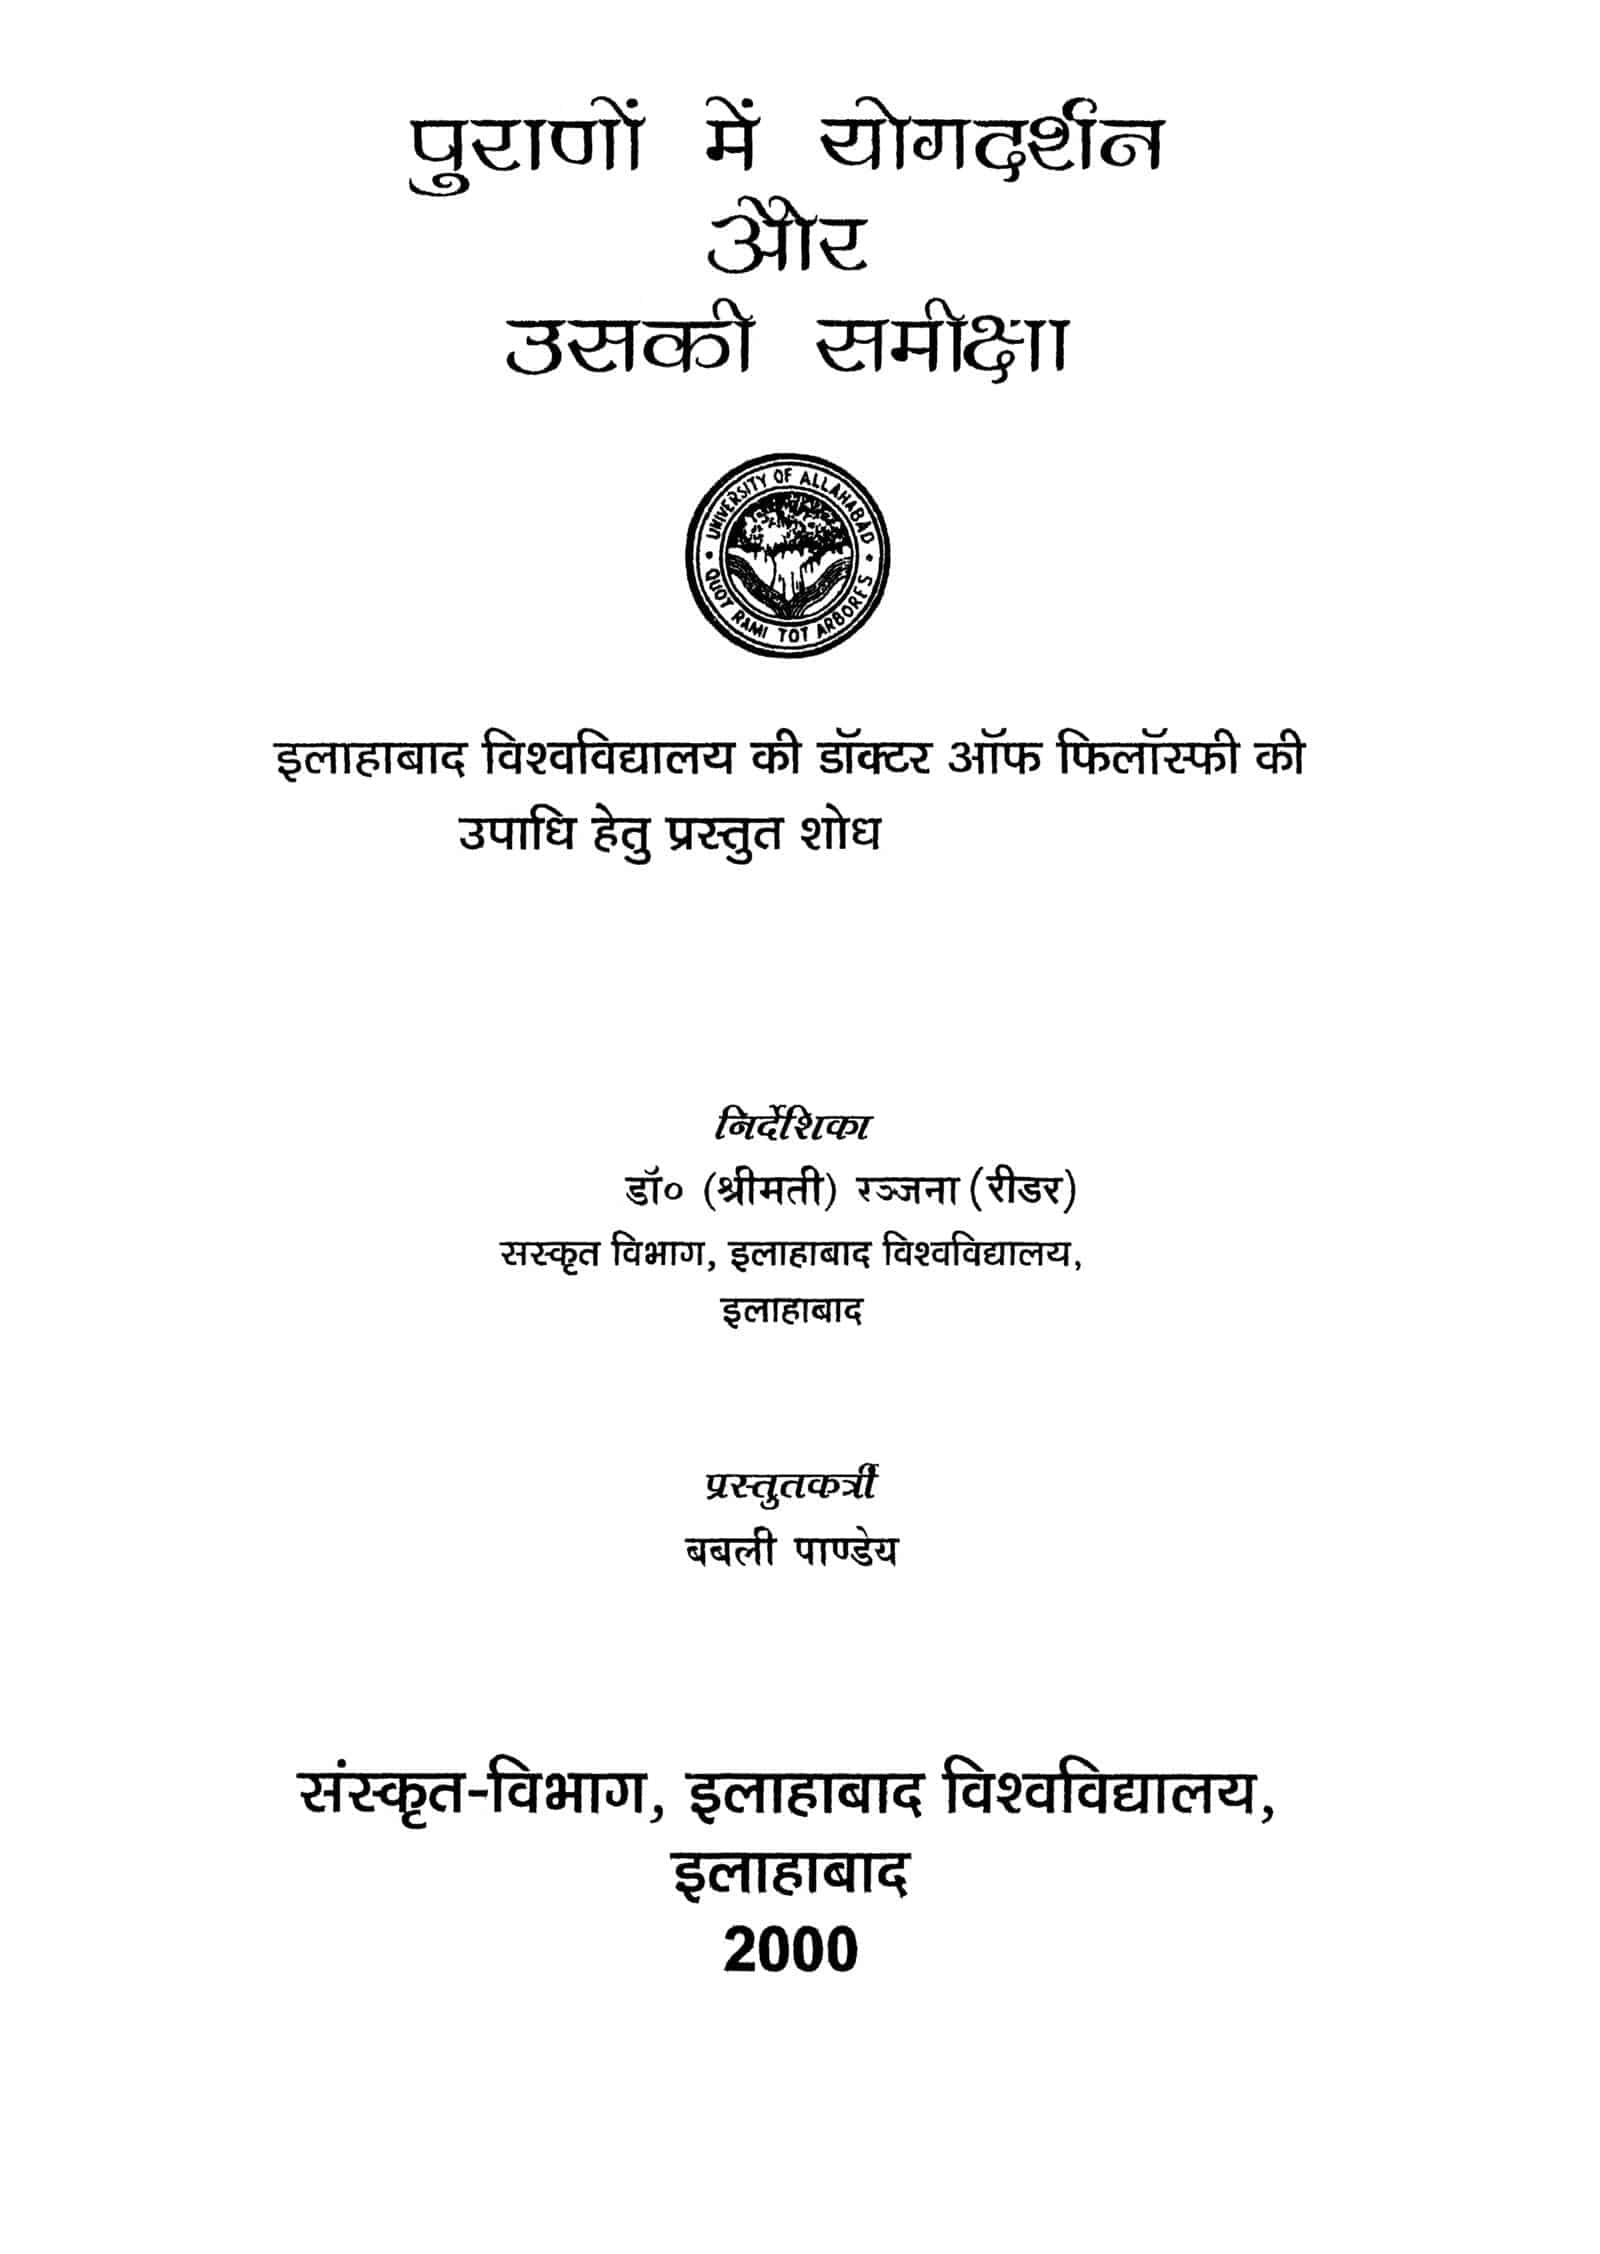 Book Image : पुराणों में योगदर्शन और उसकी समीक्षा  - Punano Me Yogdarshan Aur Uski Sameeksha